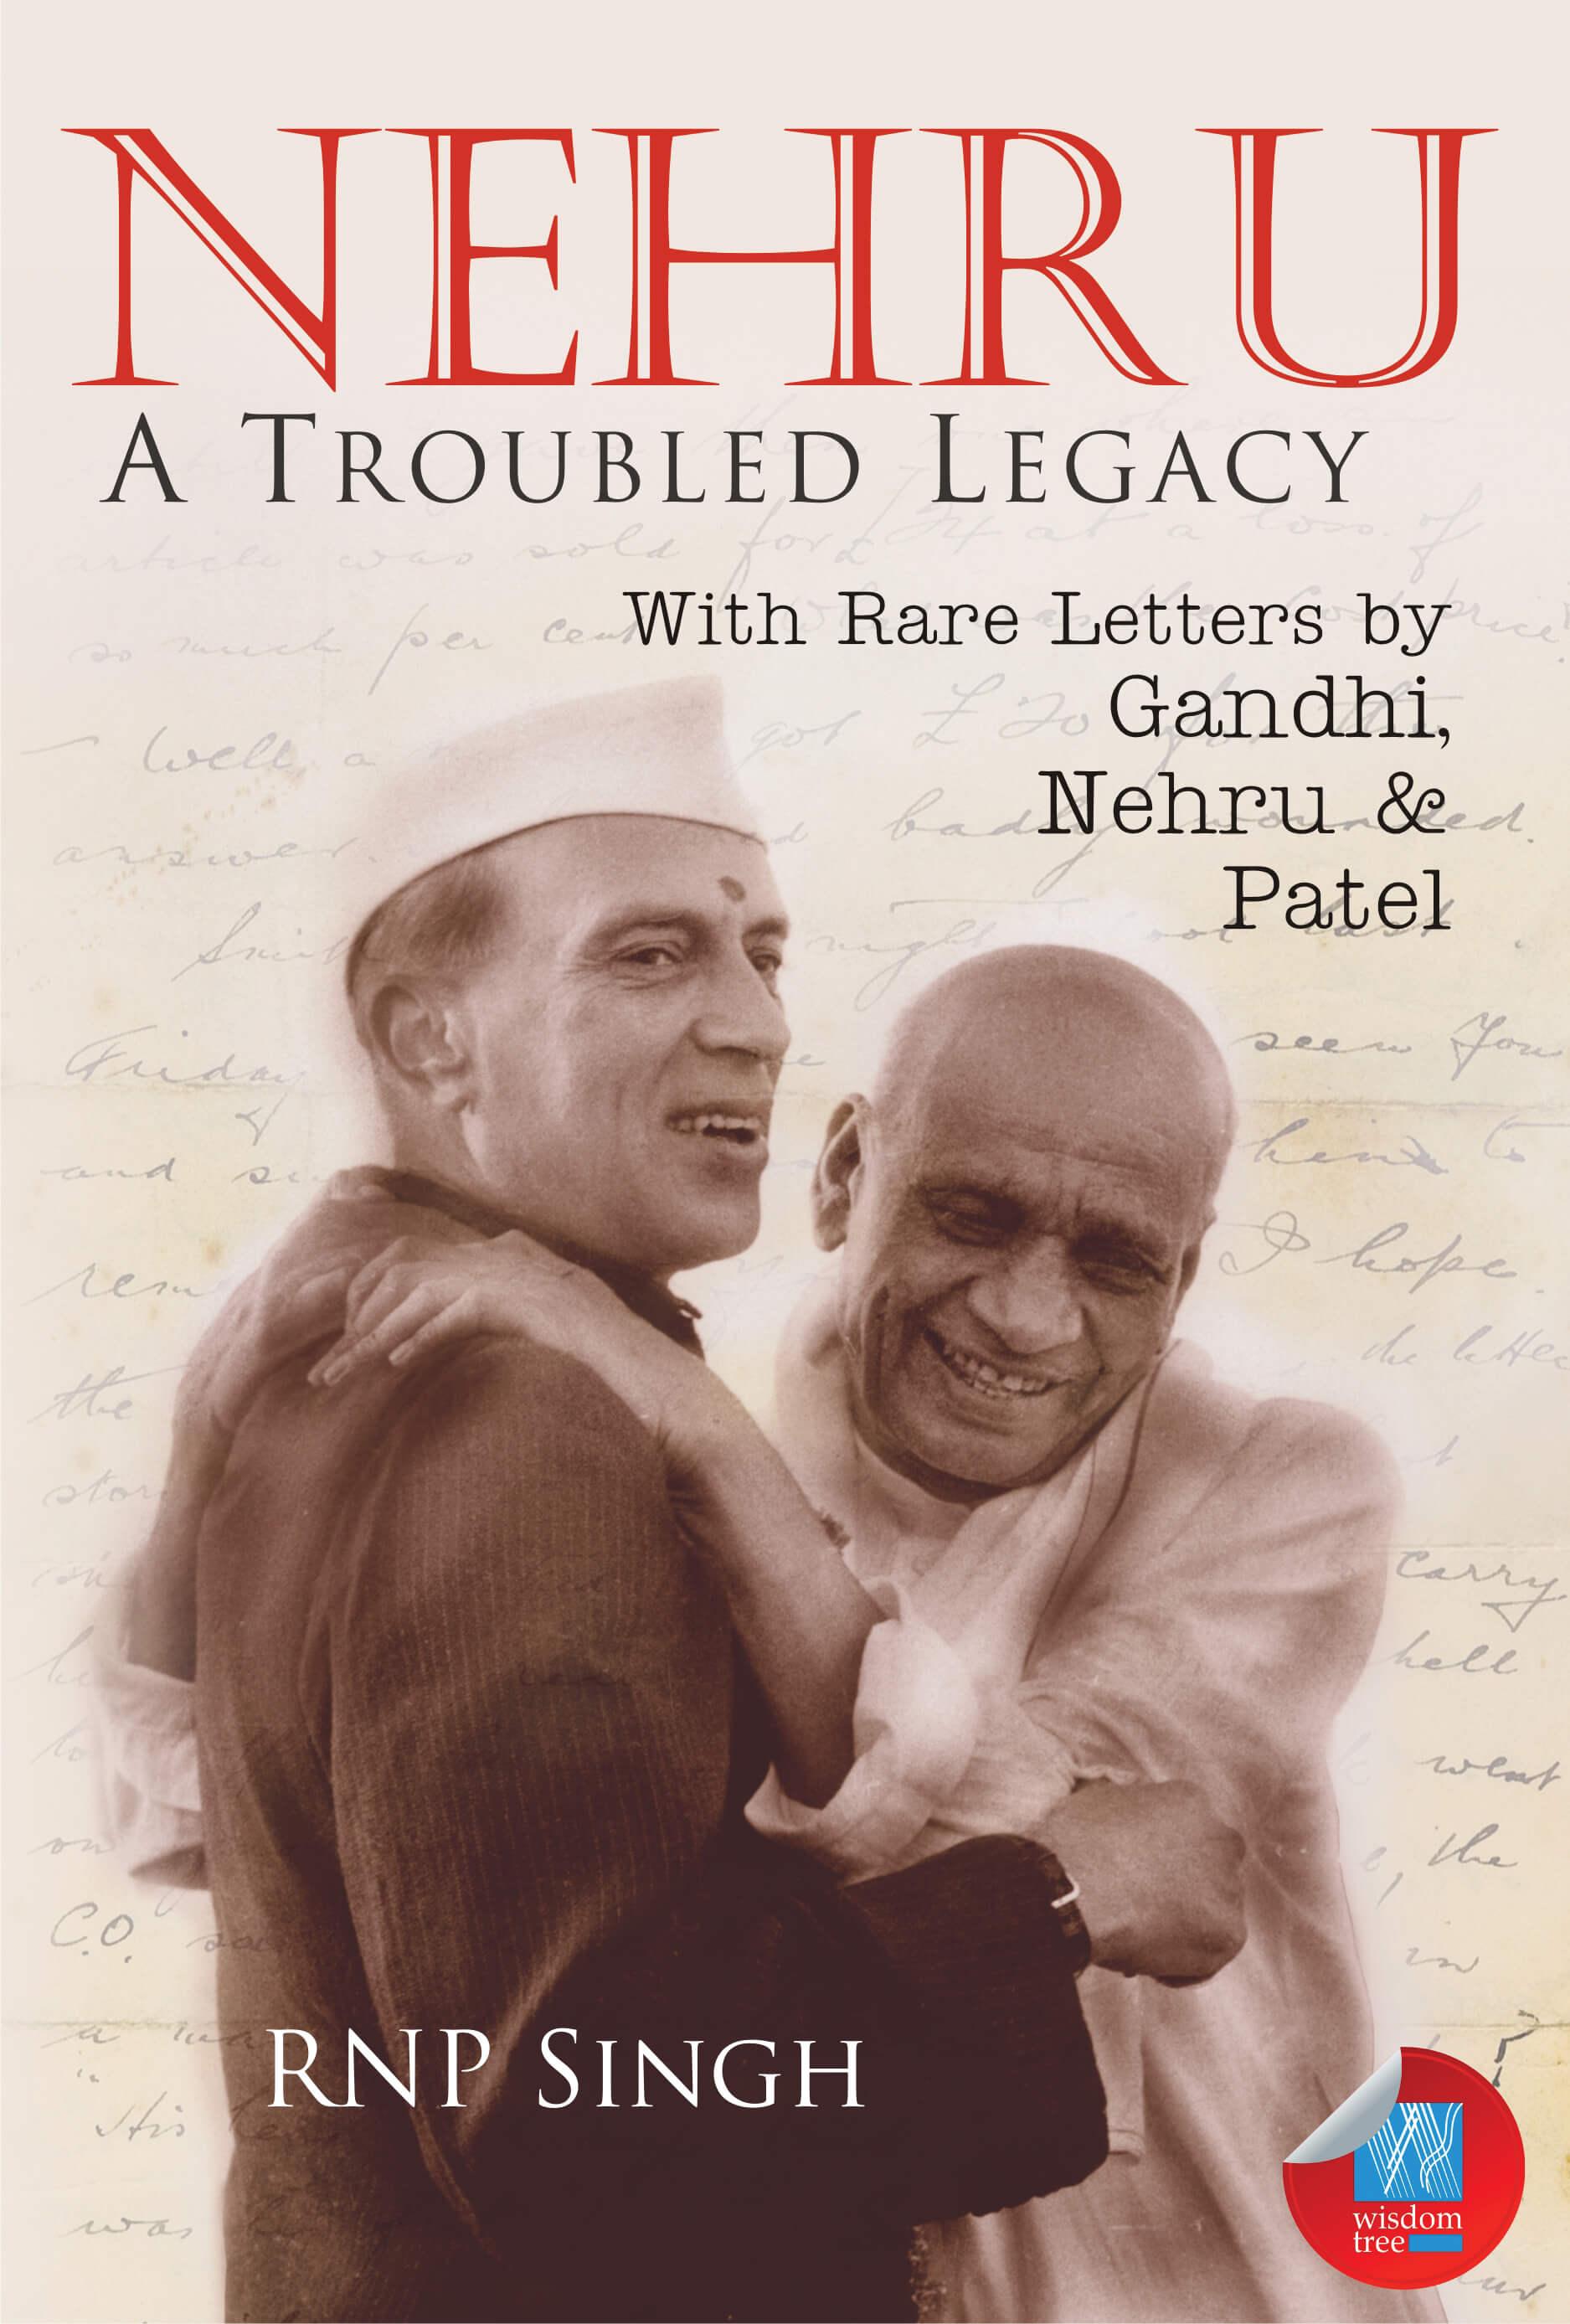 Nehru: A Troubled Legacy. With Rare Letters By Gandhi, Nehru & Patel